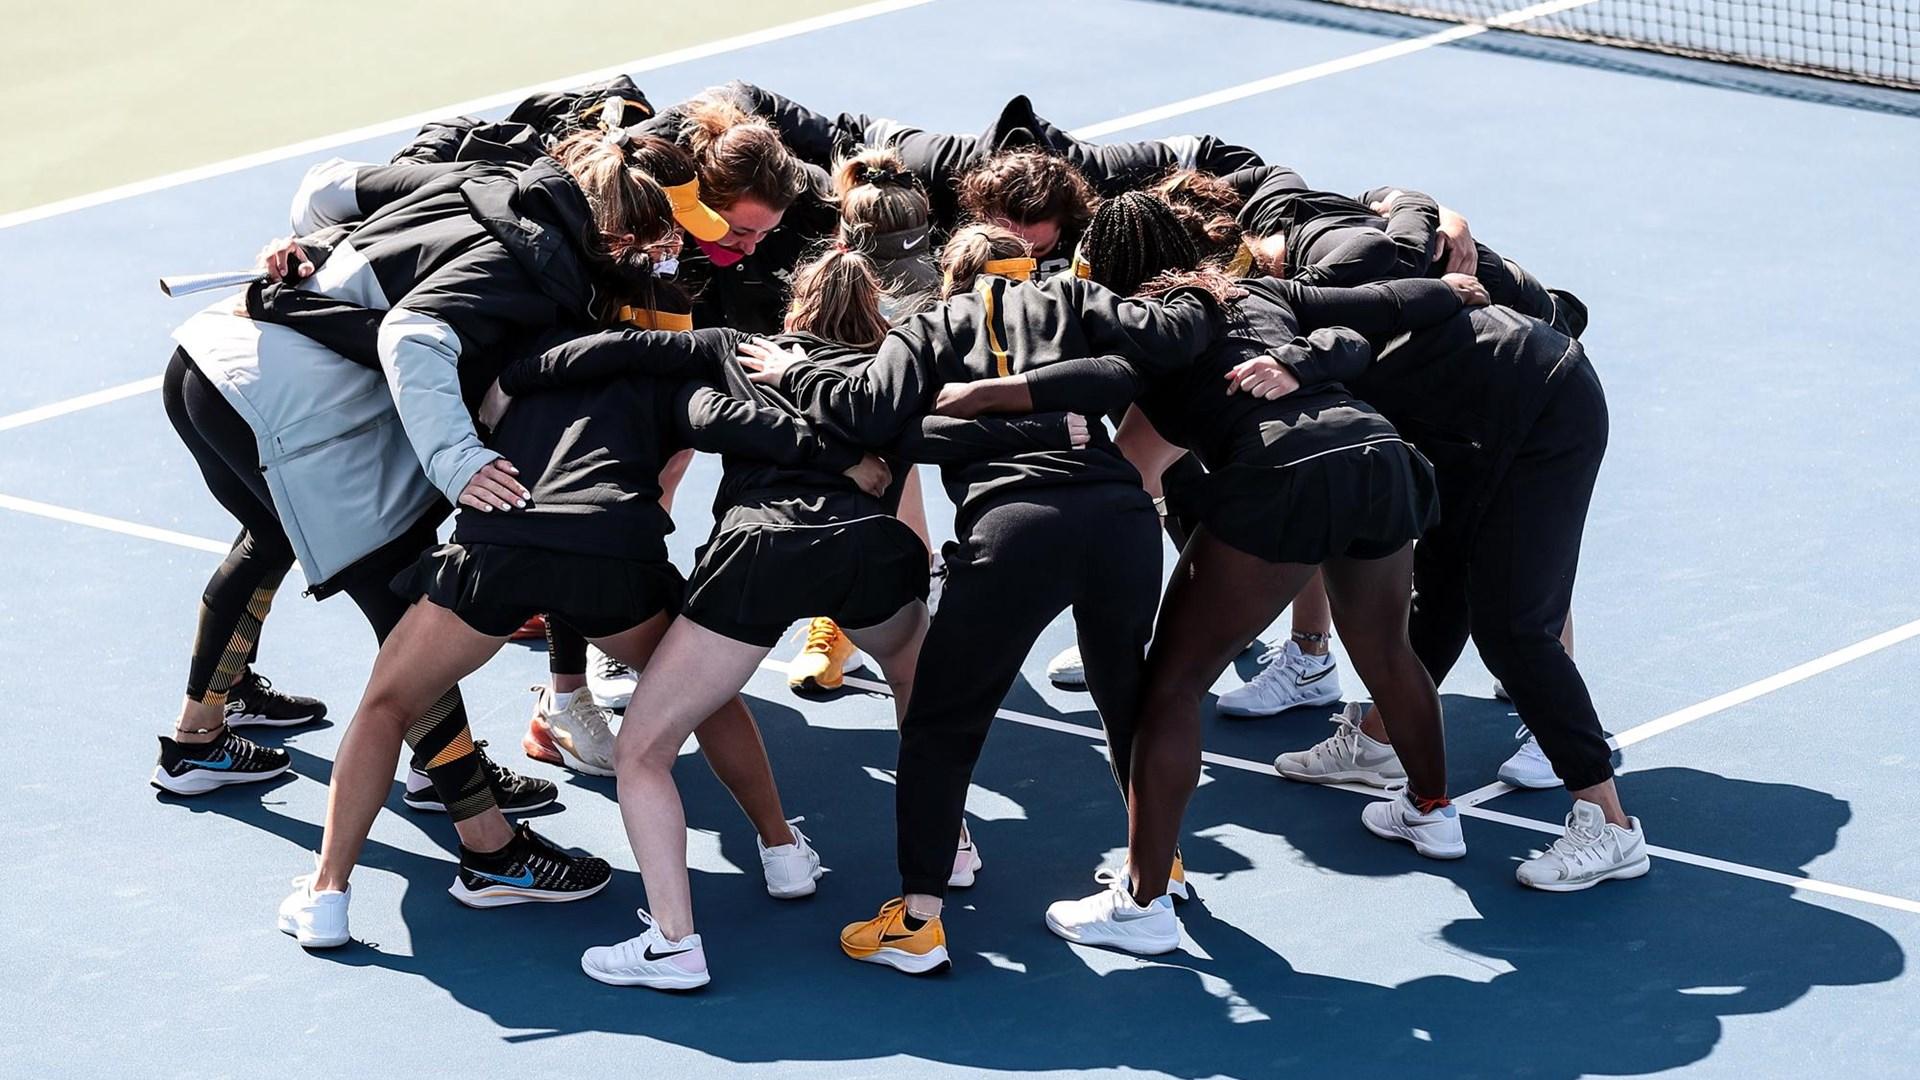 Tennis team huddle vs. Auburn